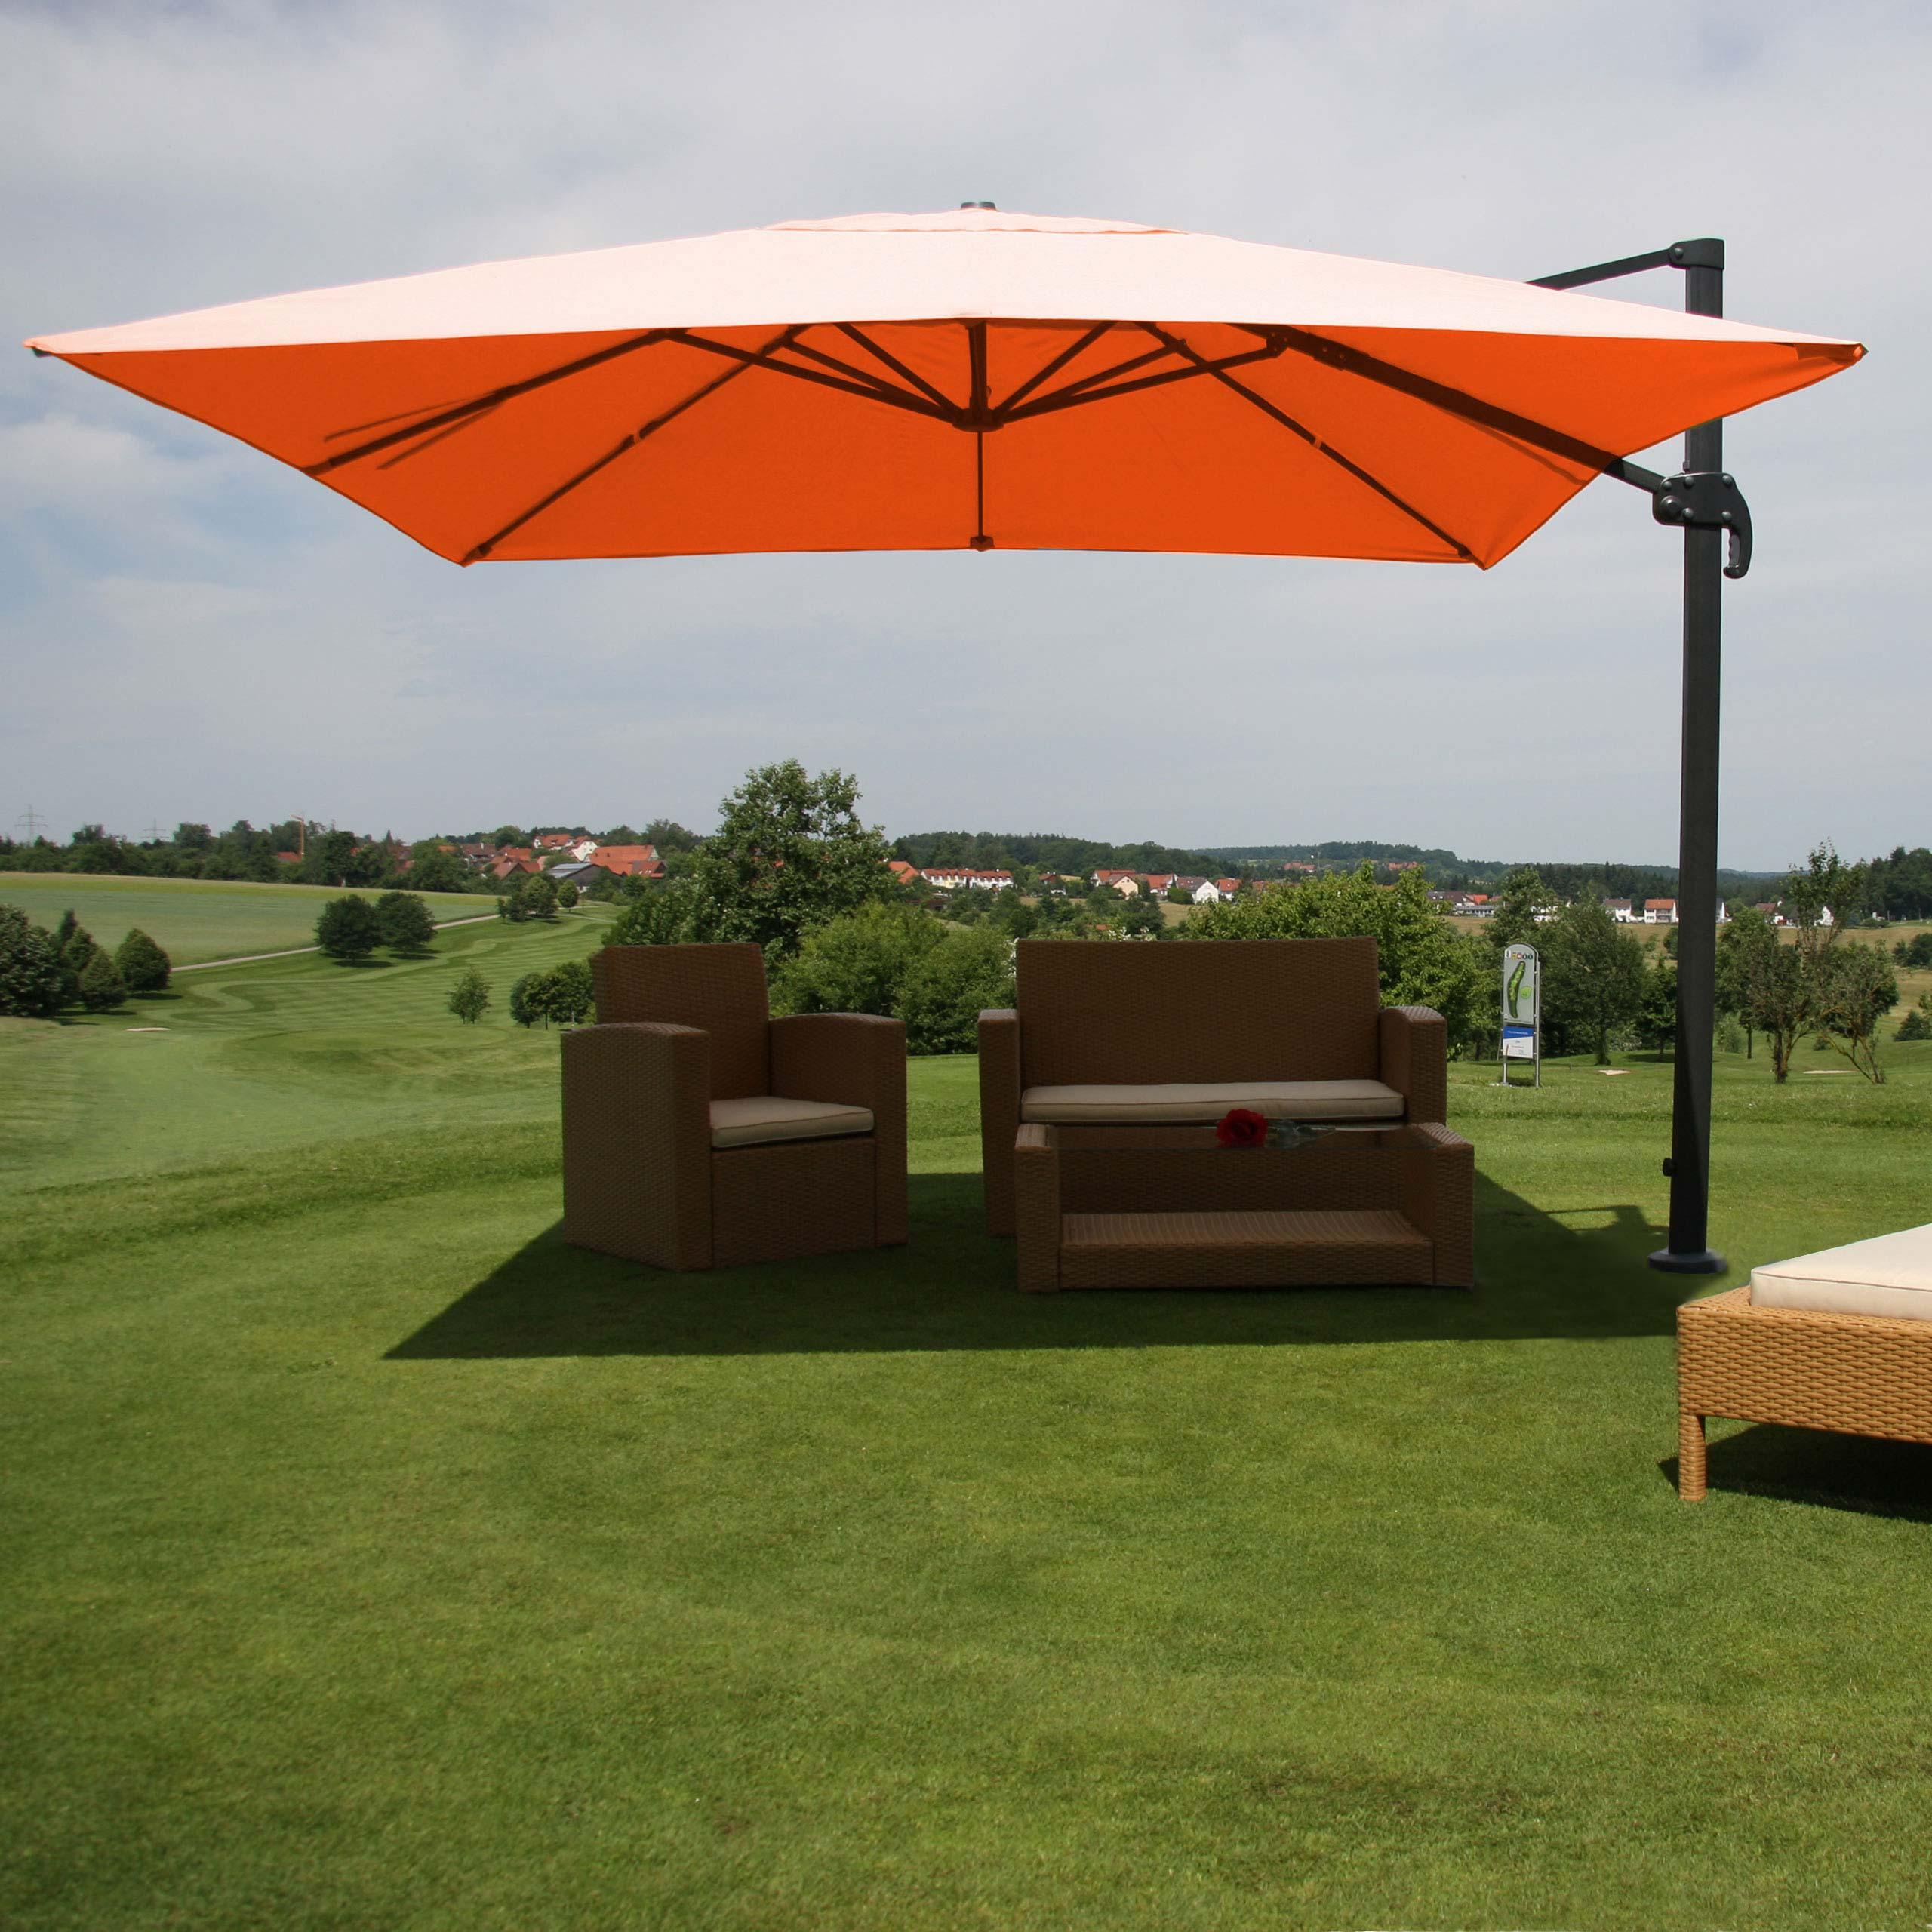 gastronomie luxus sonnenschirm ampelschirm n22 terracotta. Black Bedroom Furniture Sets. Home Design Ideas